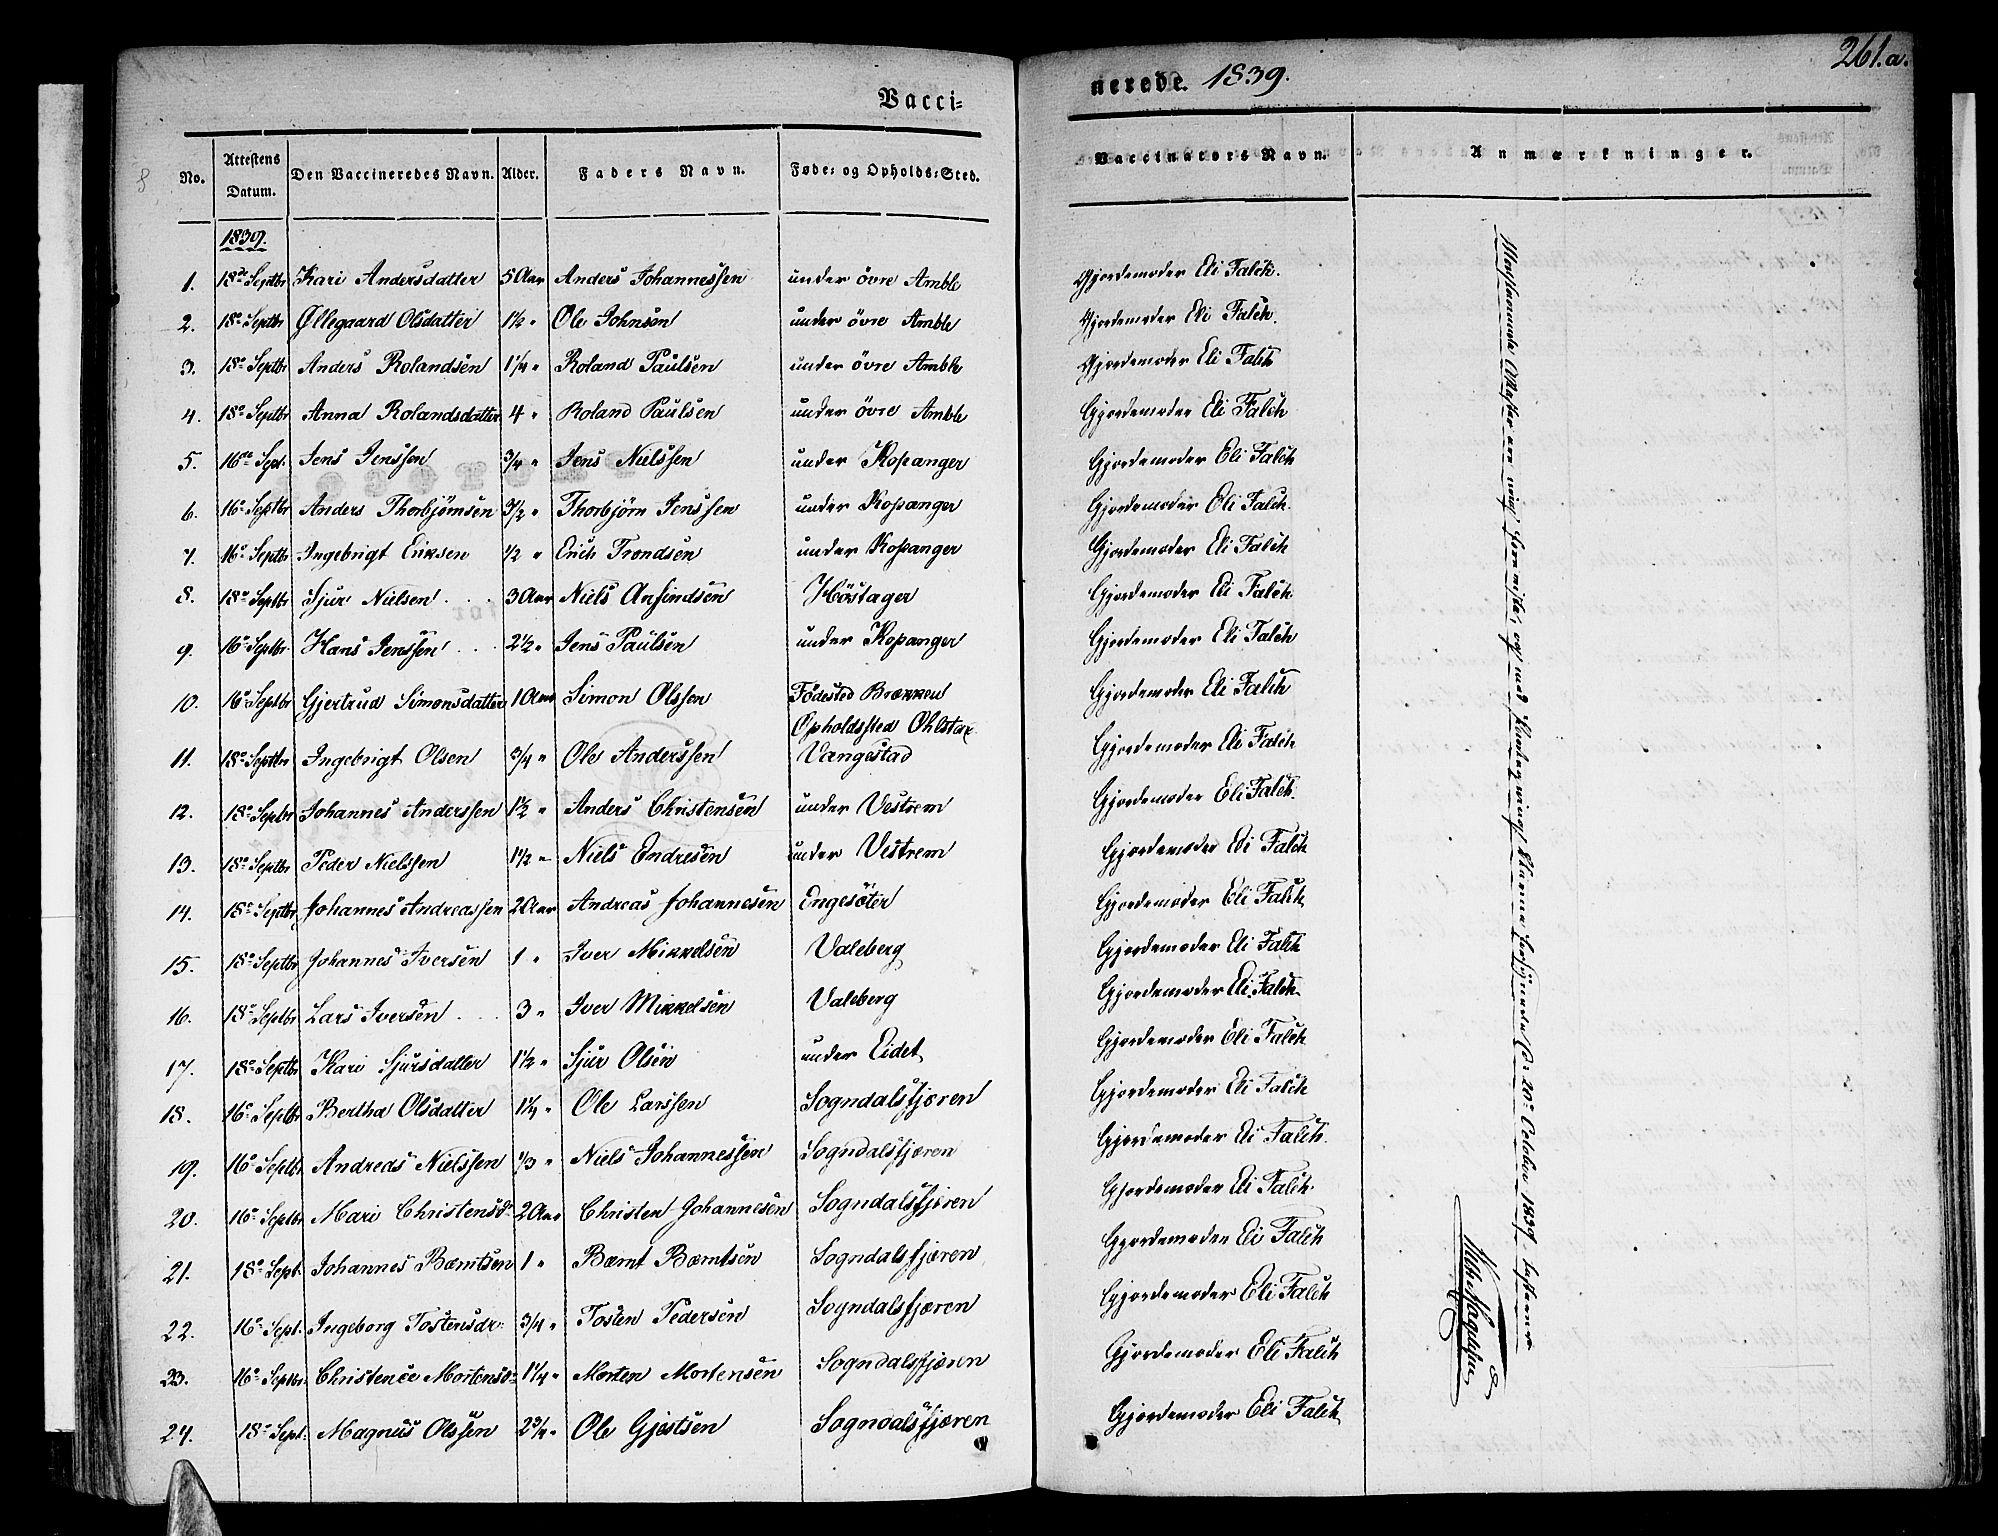 SAB, Sogndal Sokneprestembete, H/Haa/Haaa/L0011: Ministerialbok nr. A 11, 1839-1847, s. 261